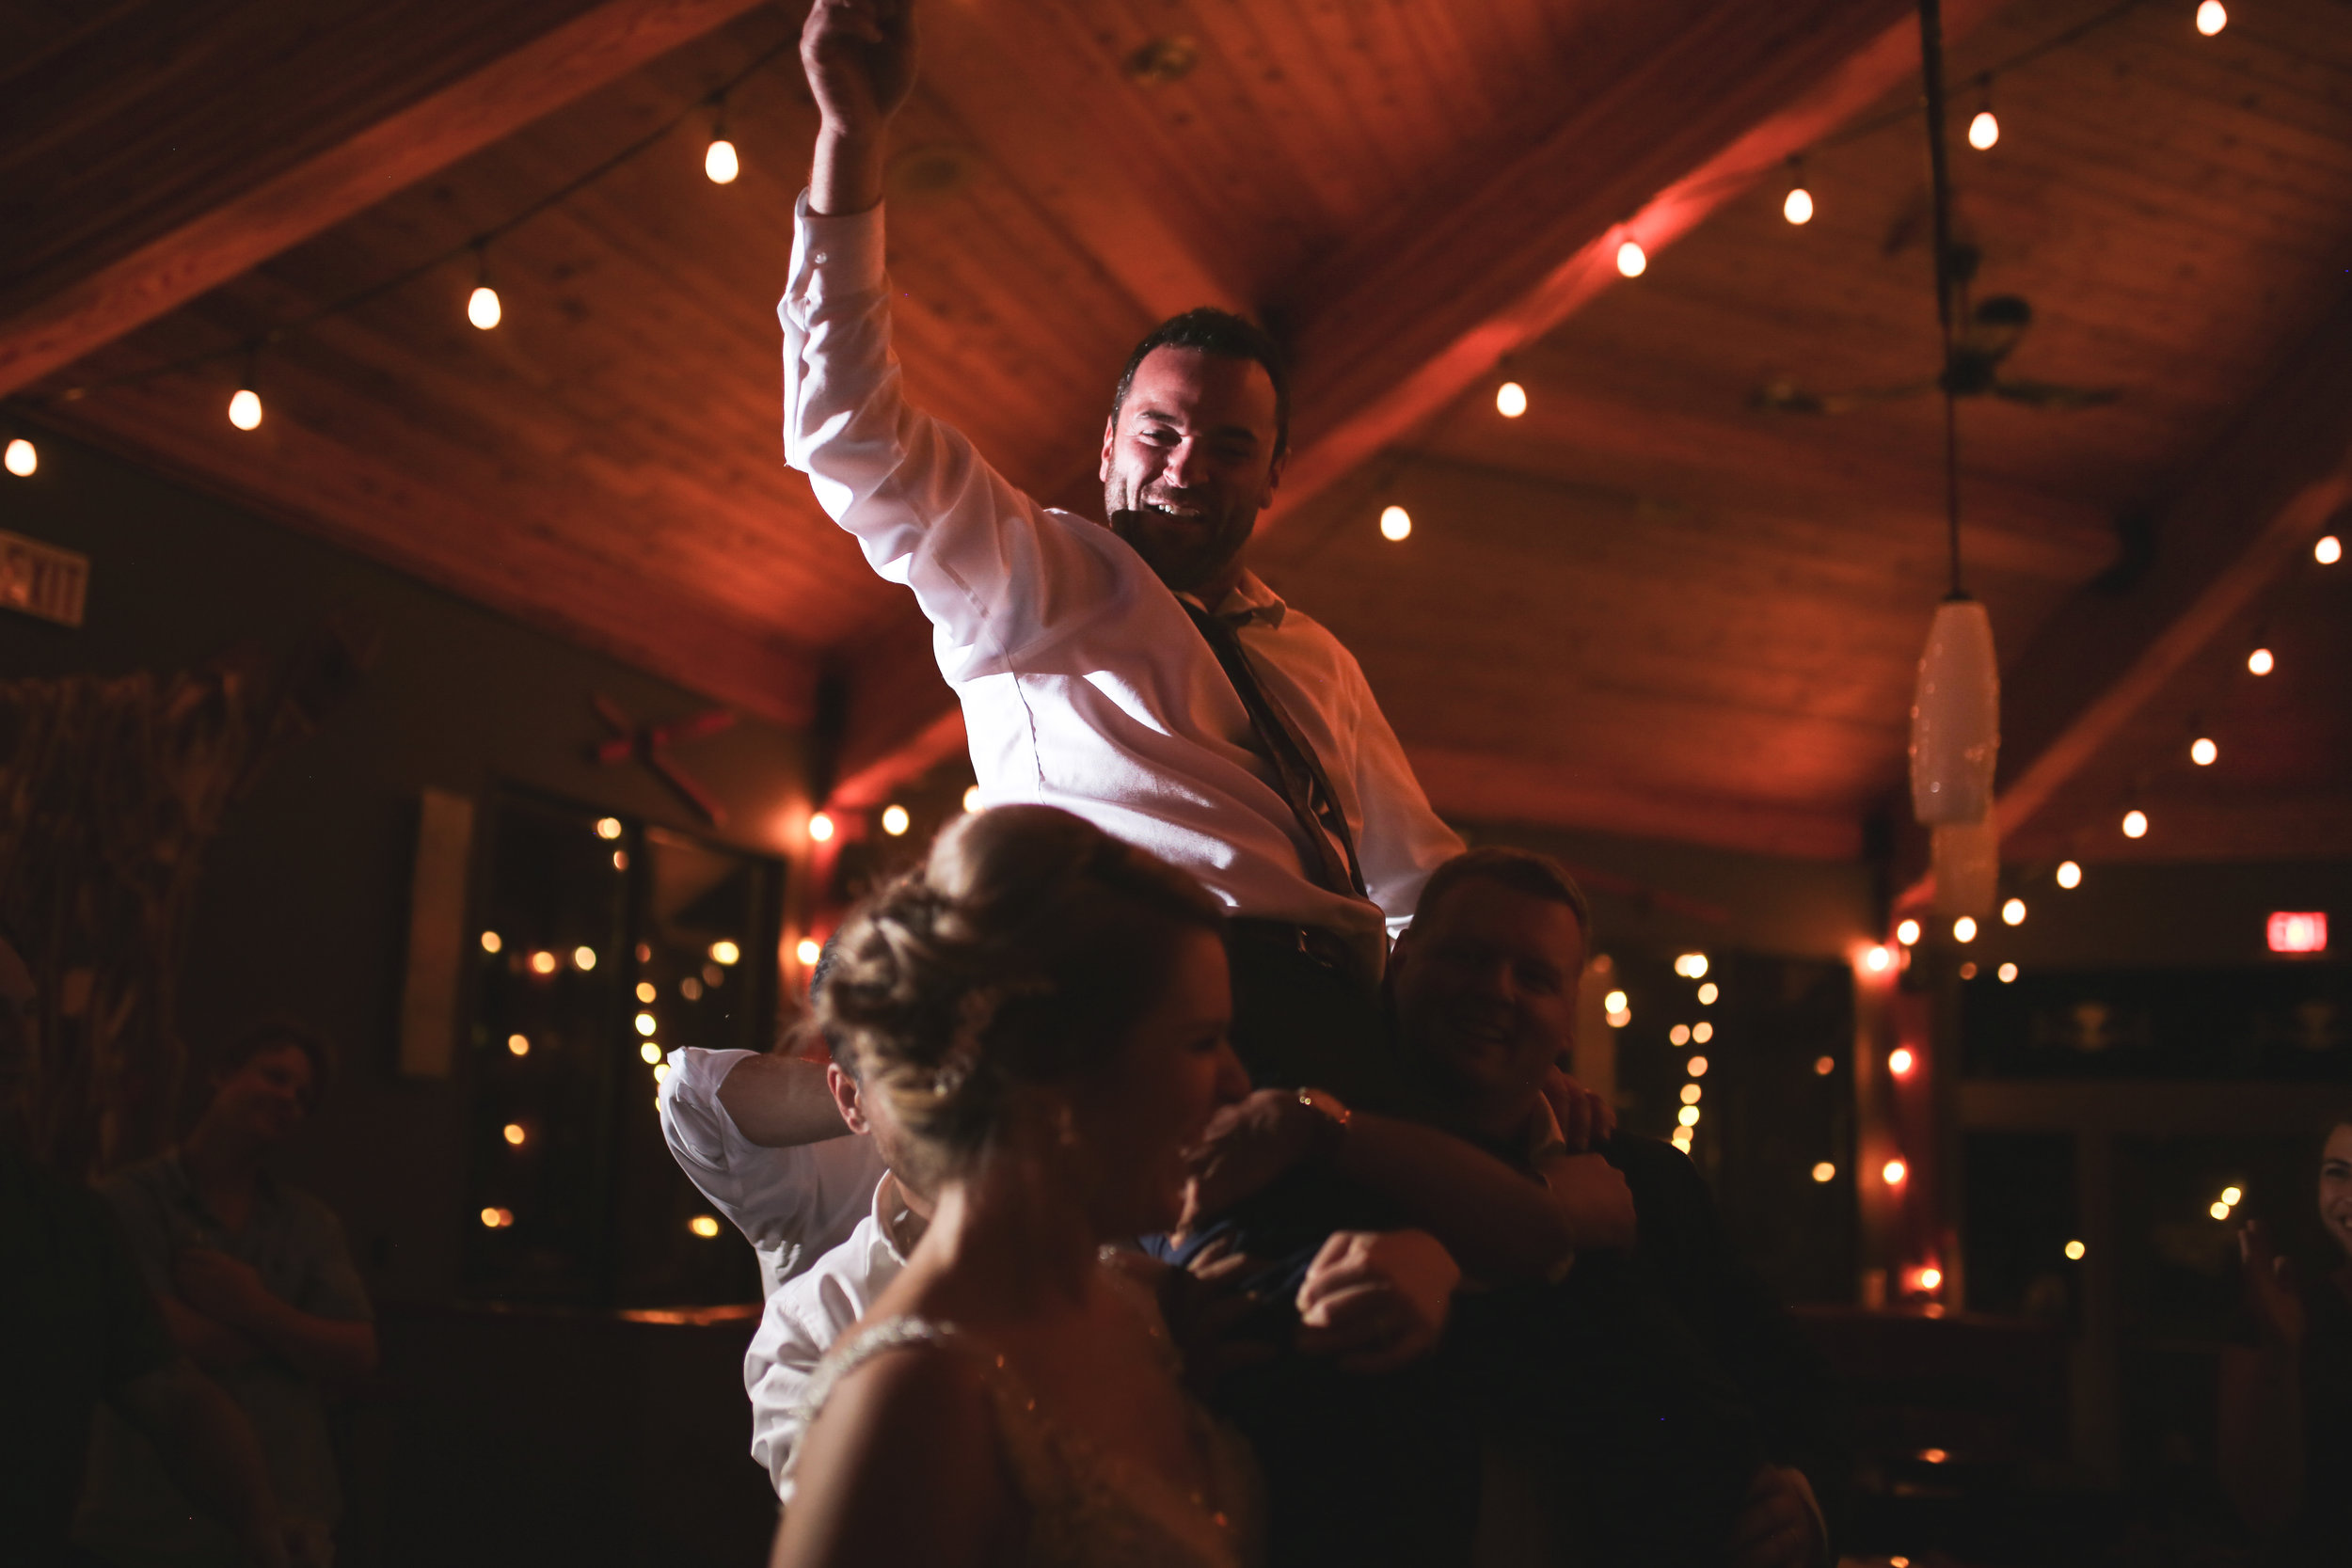 112 Adam Ziorio Photography - Vitoria wedding photographer Nick&Bree Fernie Wedding.jpg